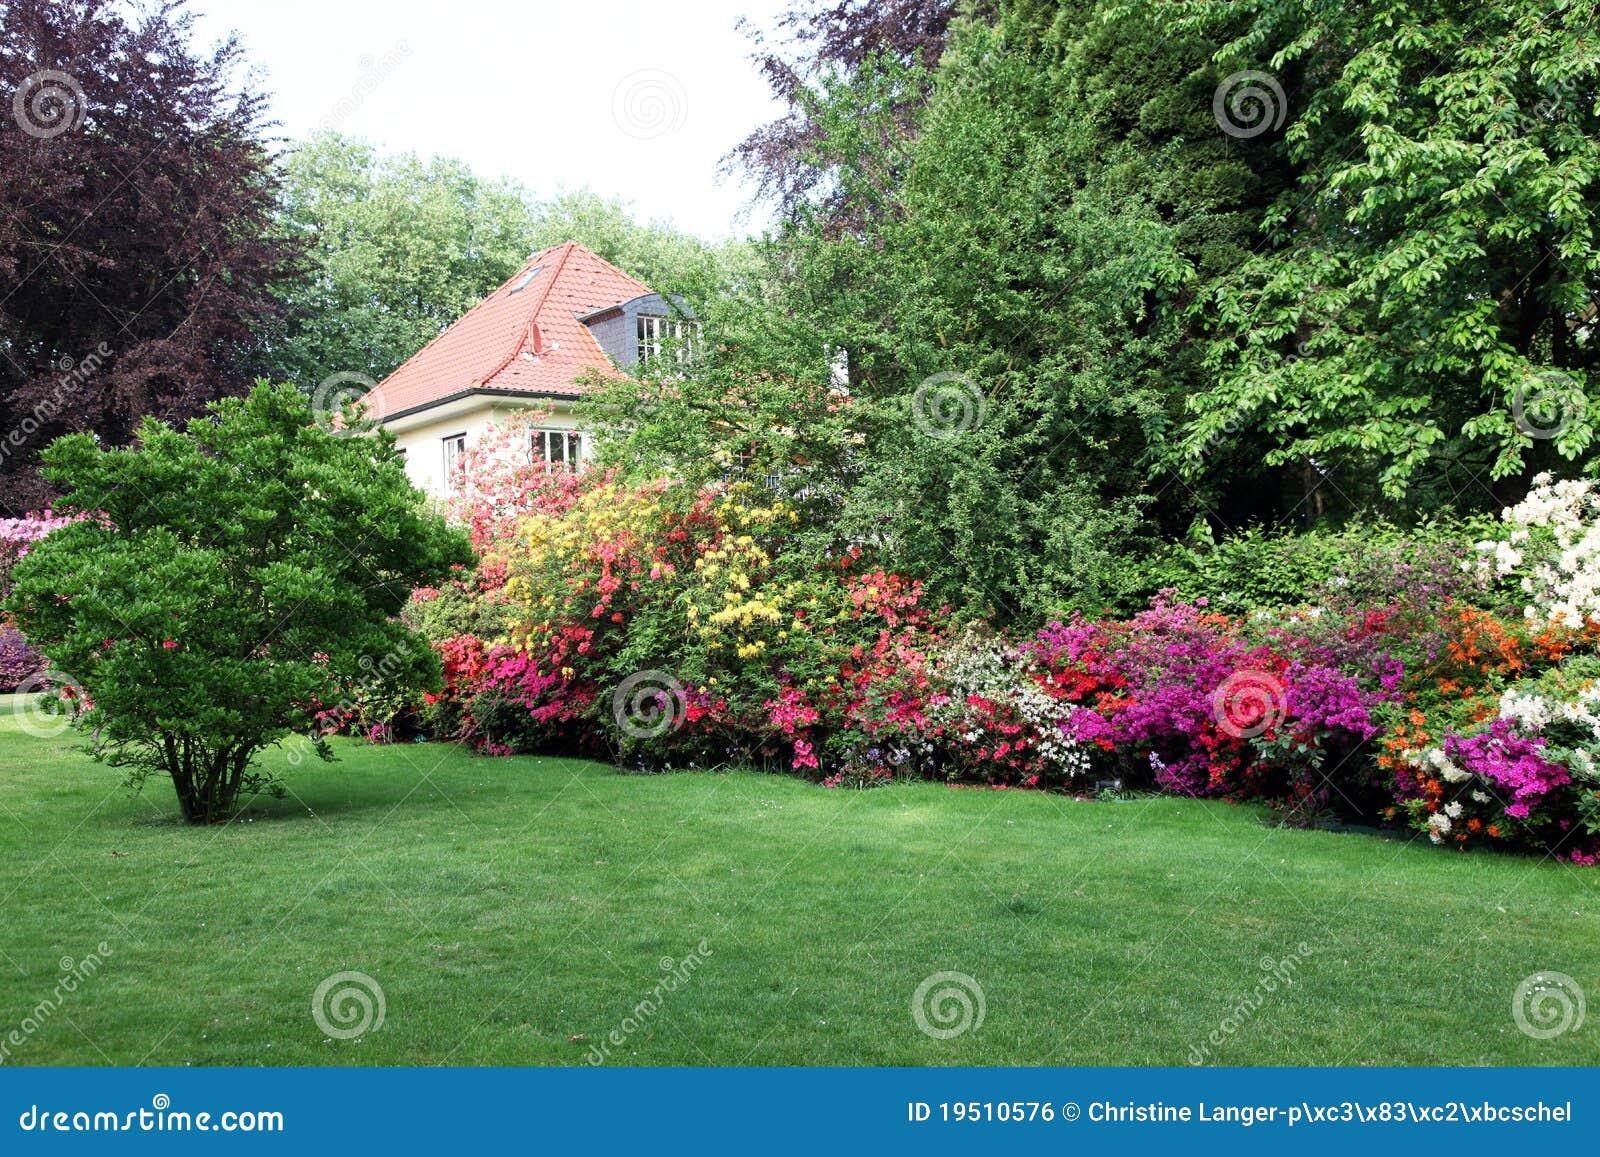 Mooi huis met tuin stock foto afbeelding bestaande uit rododendron 19510576 - Mooi huis ...